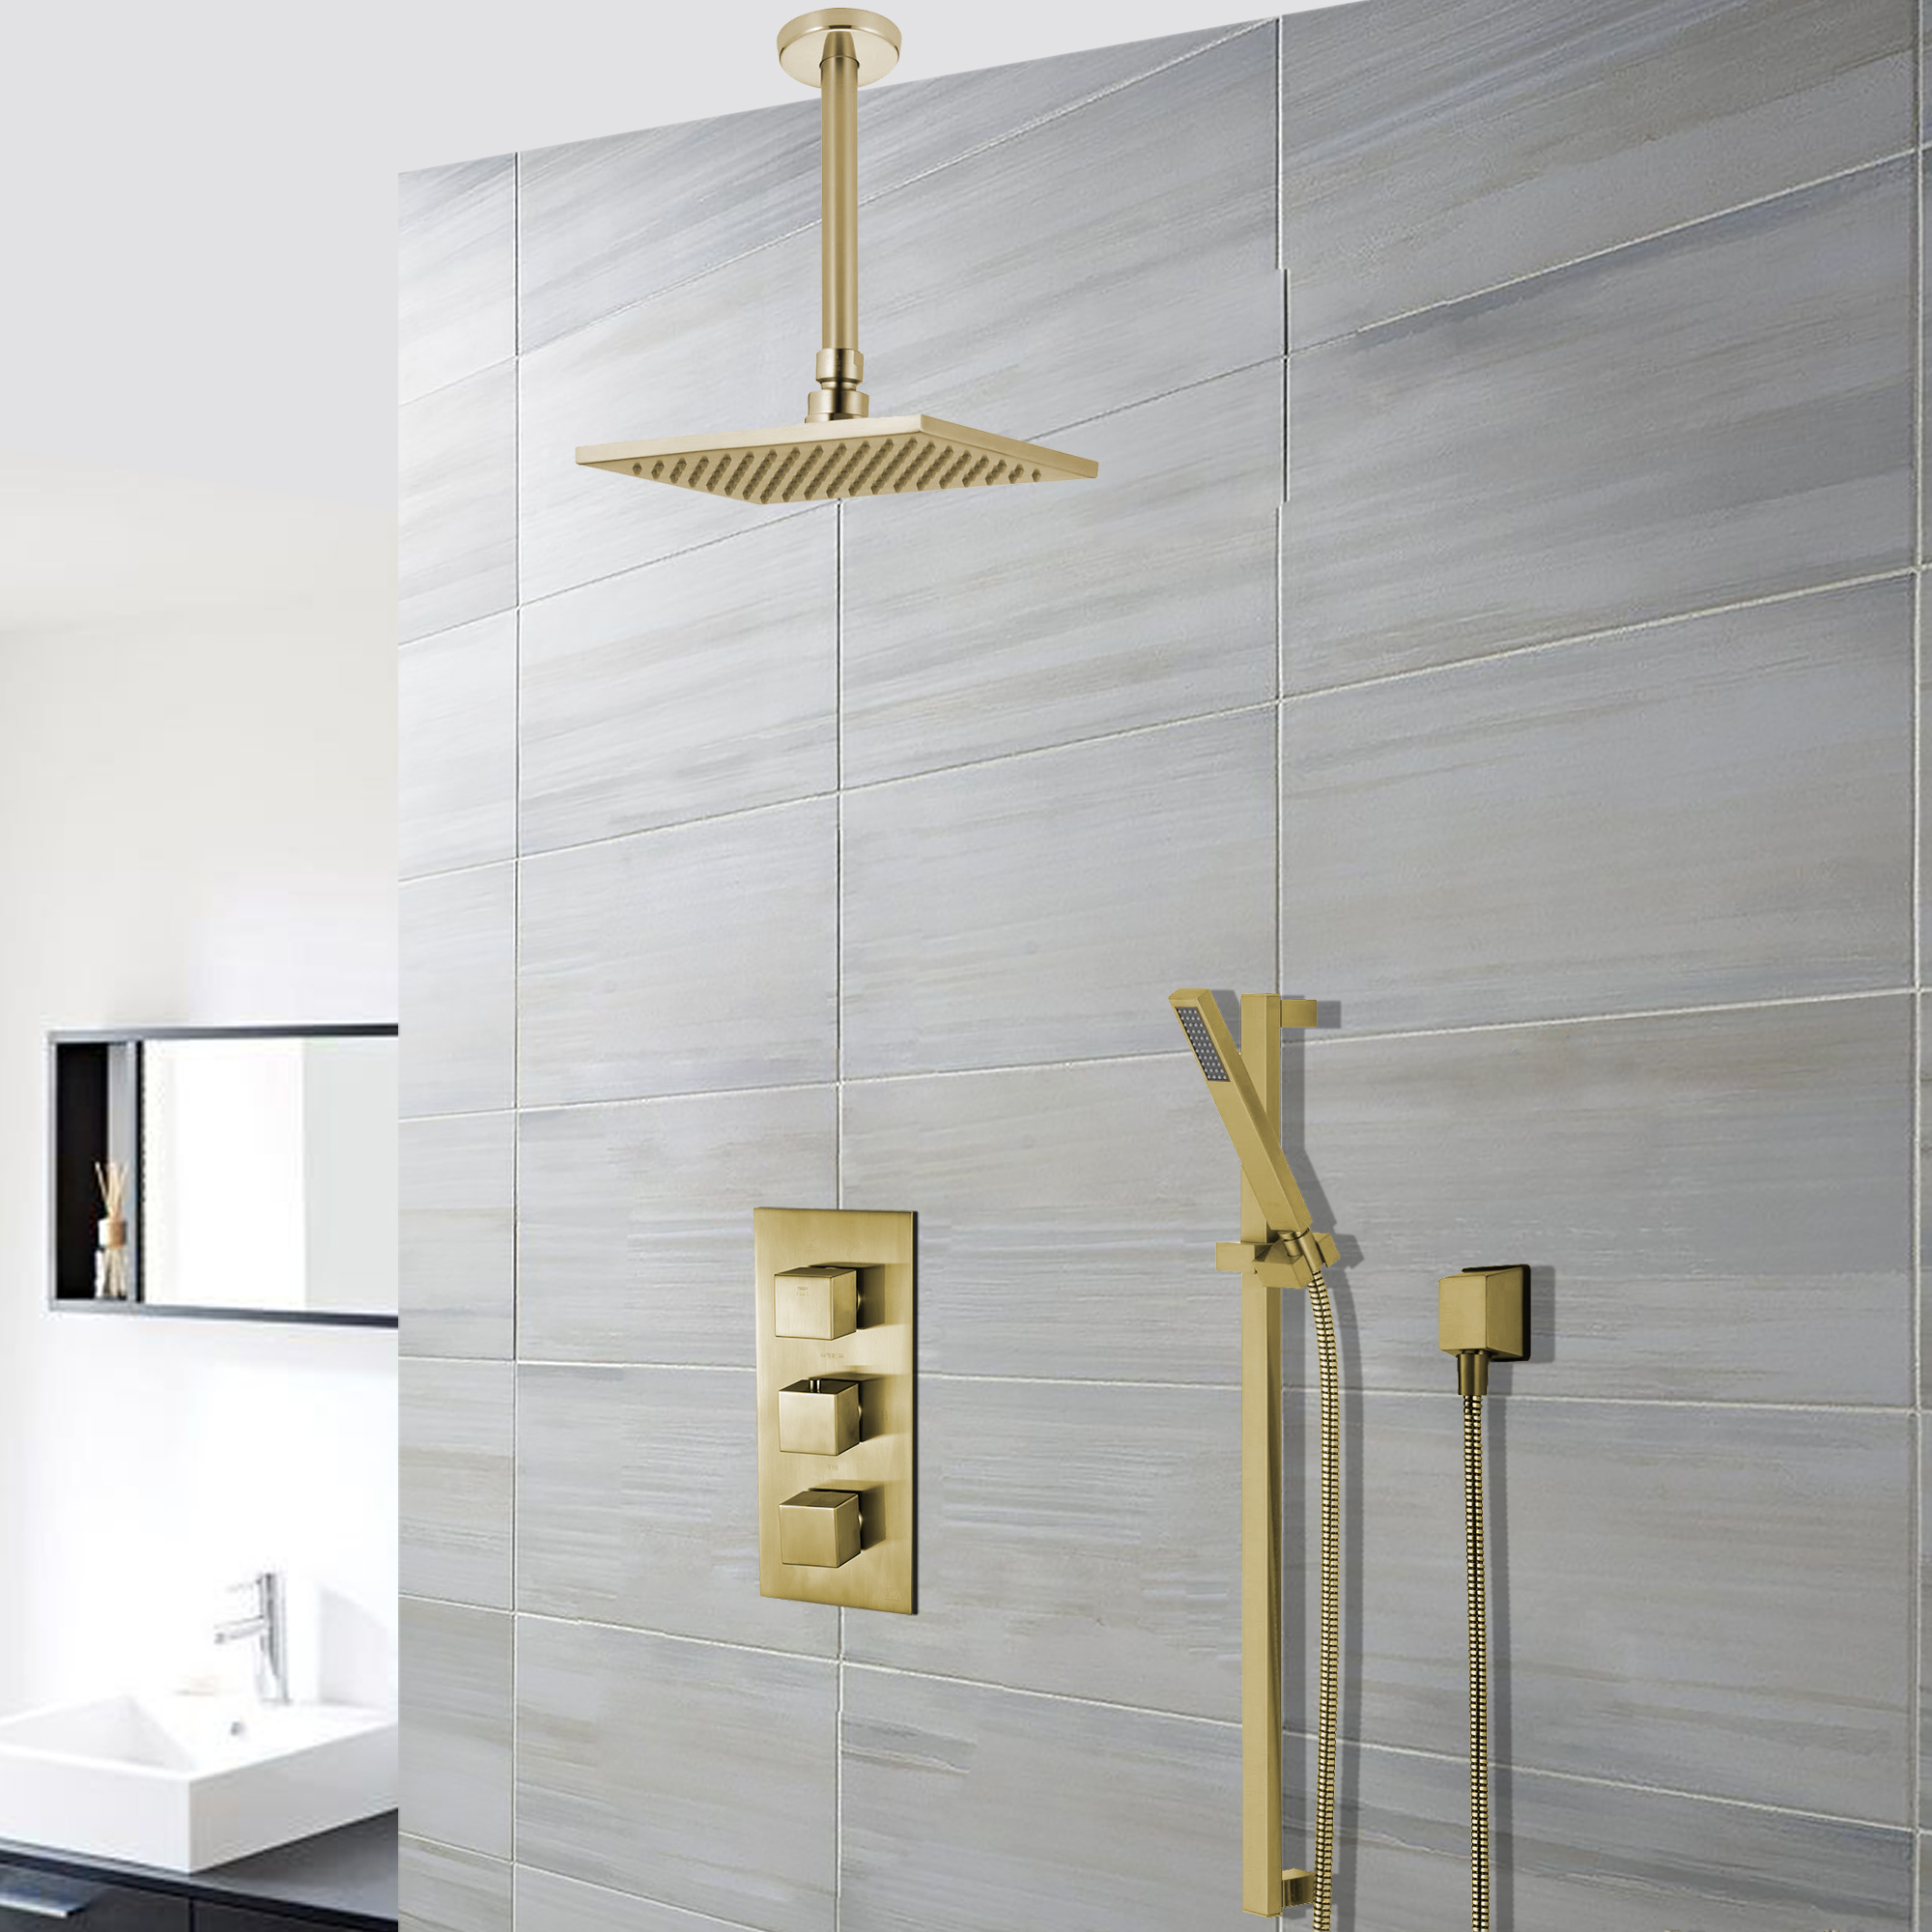 Benete Square Brushed Gold Rain Shower System Faucet Set 2 Outlets Ceiling Head & Handset